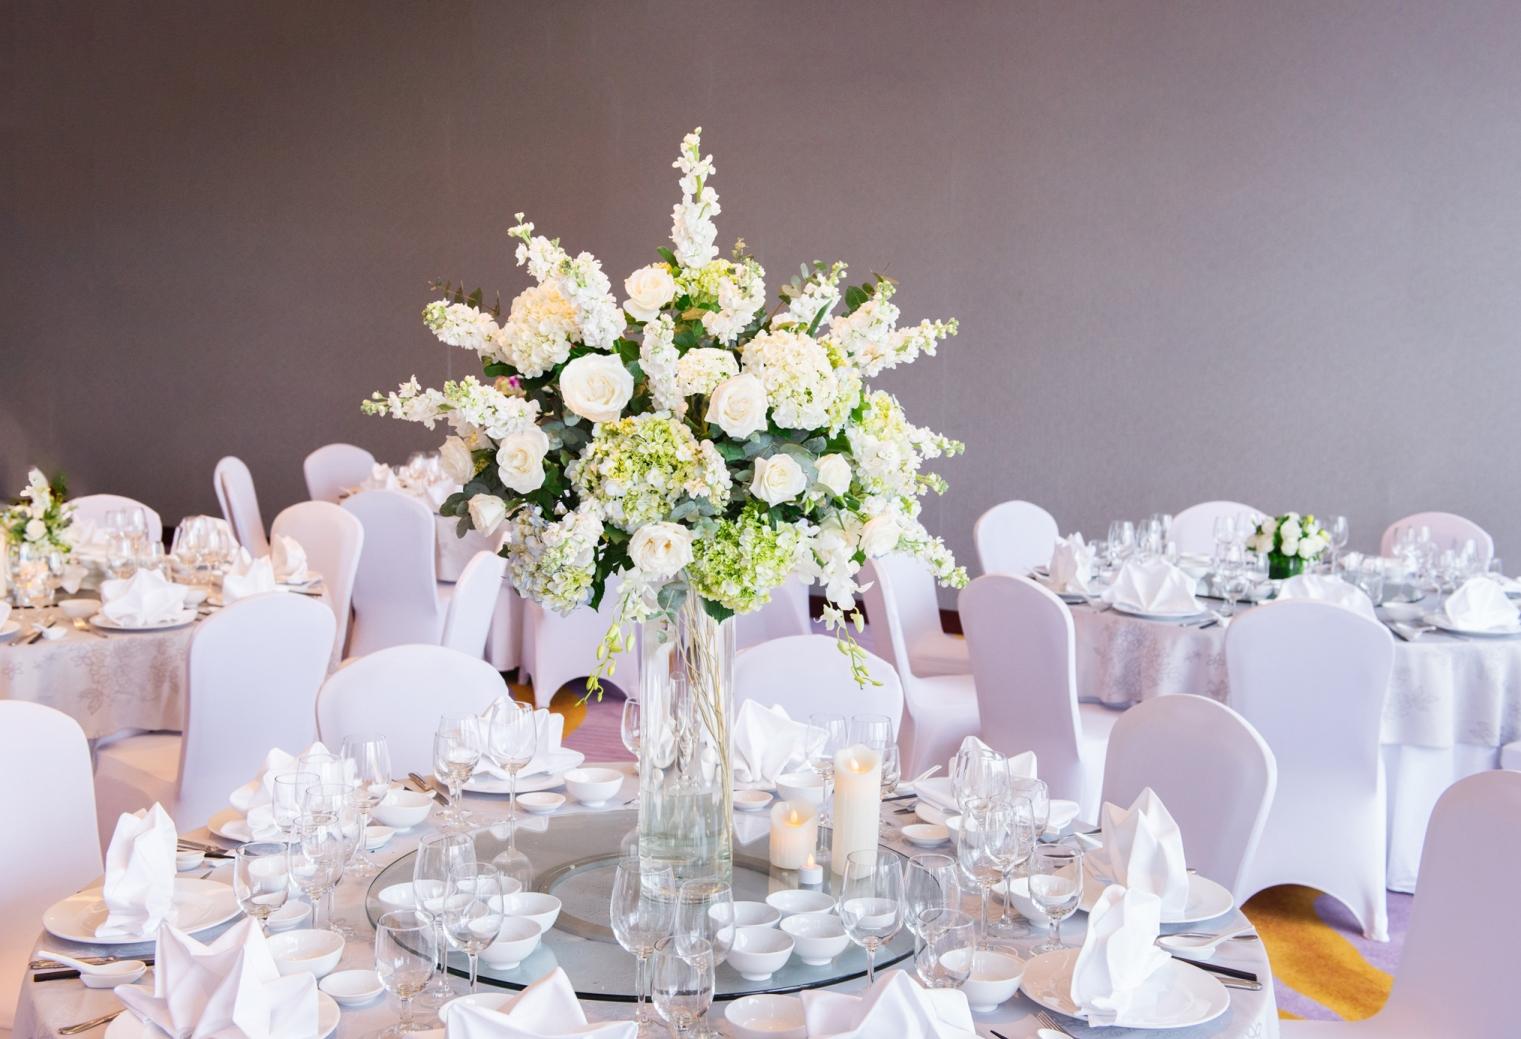 Hanoi wedding banquet table arrangement with white bouquet